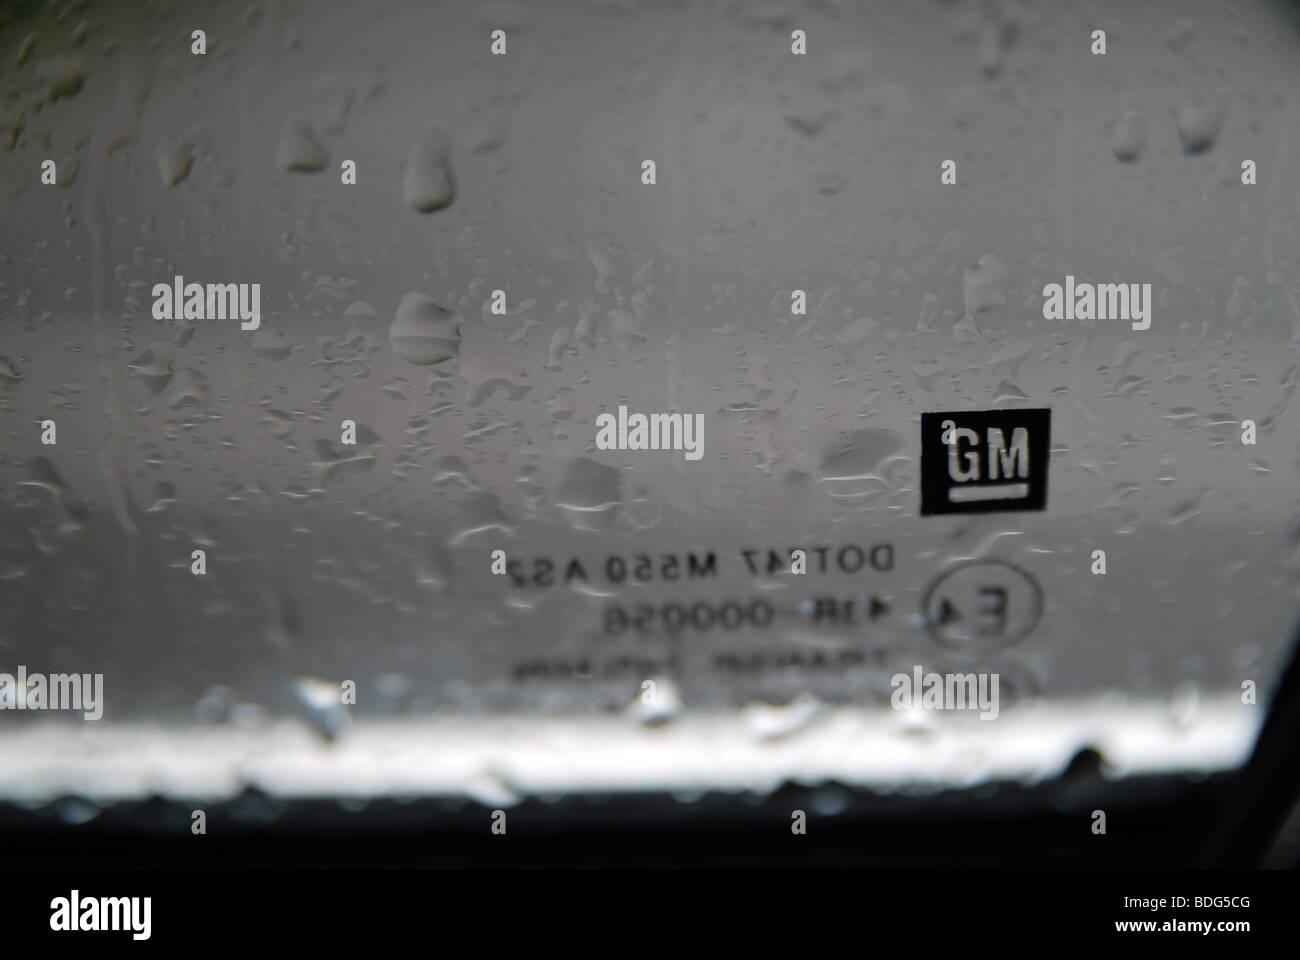 GM - General Motors logo on a car windscreen in the rain - Stock Image